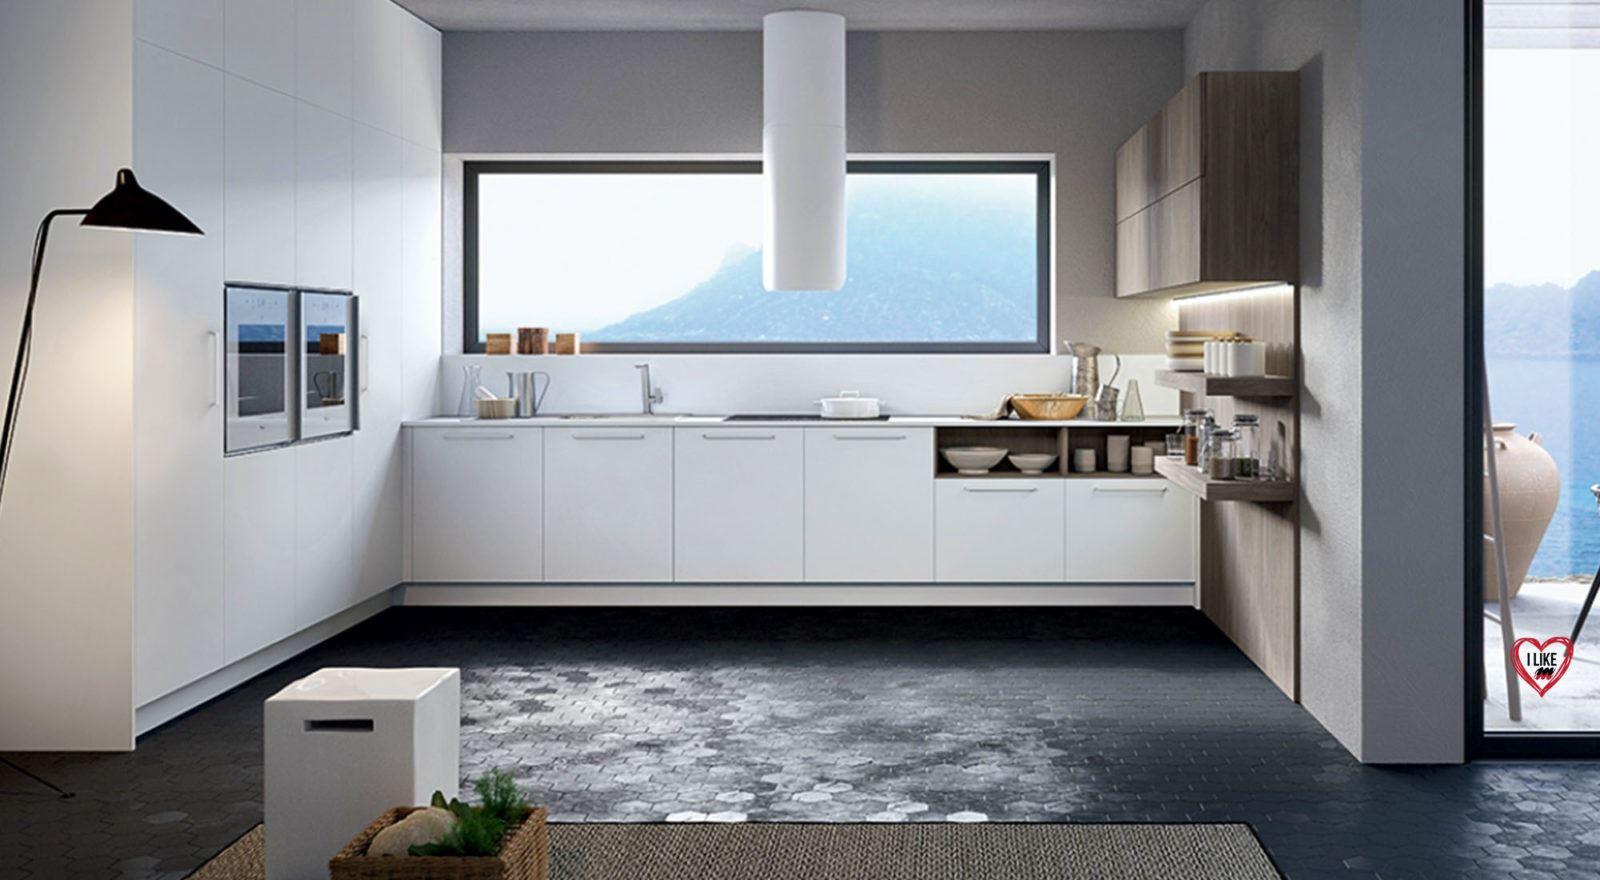 Best cucina moderna angolare gallery ideas design 2017 - Cucine a padova ...